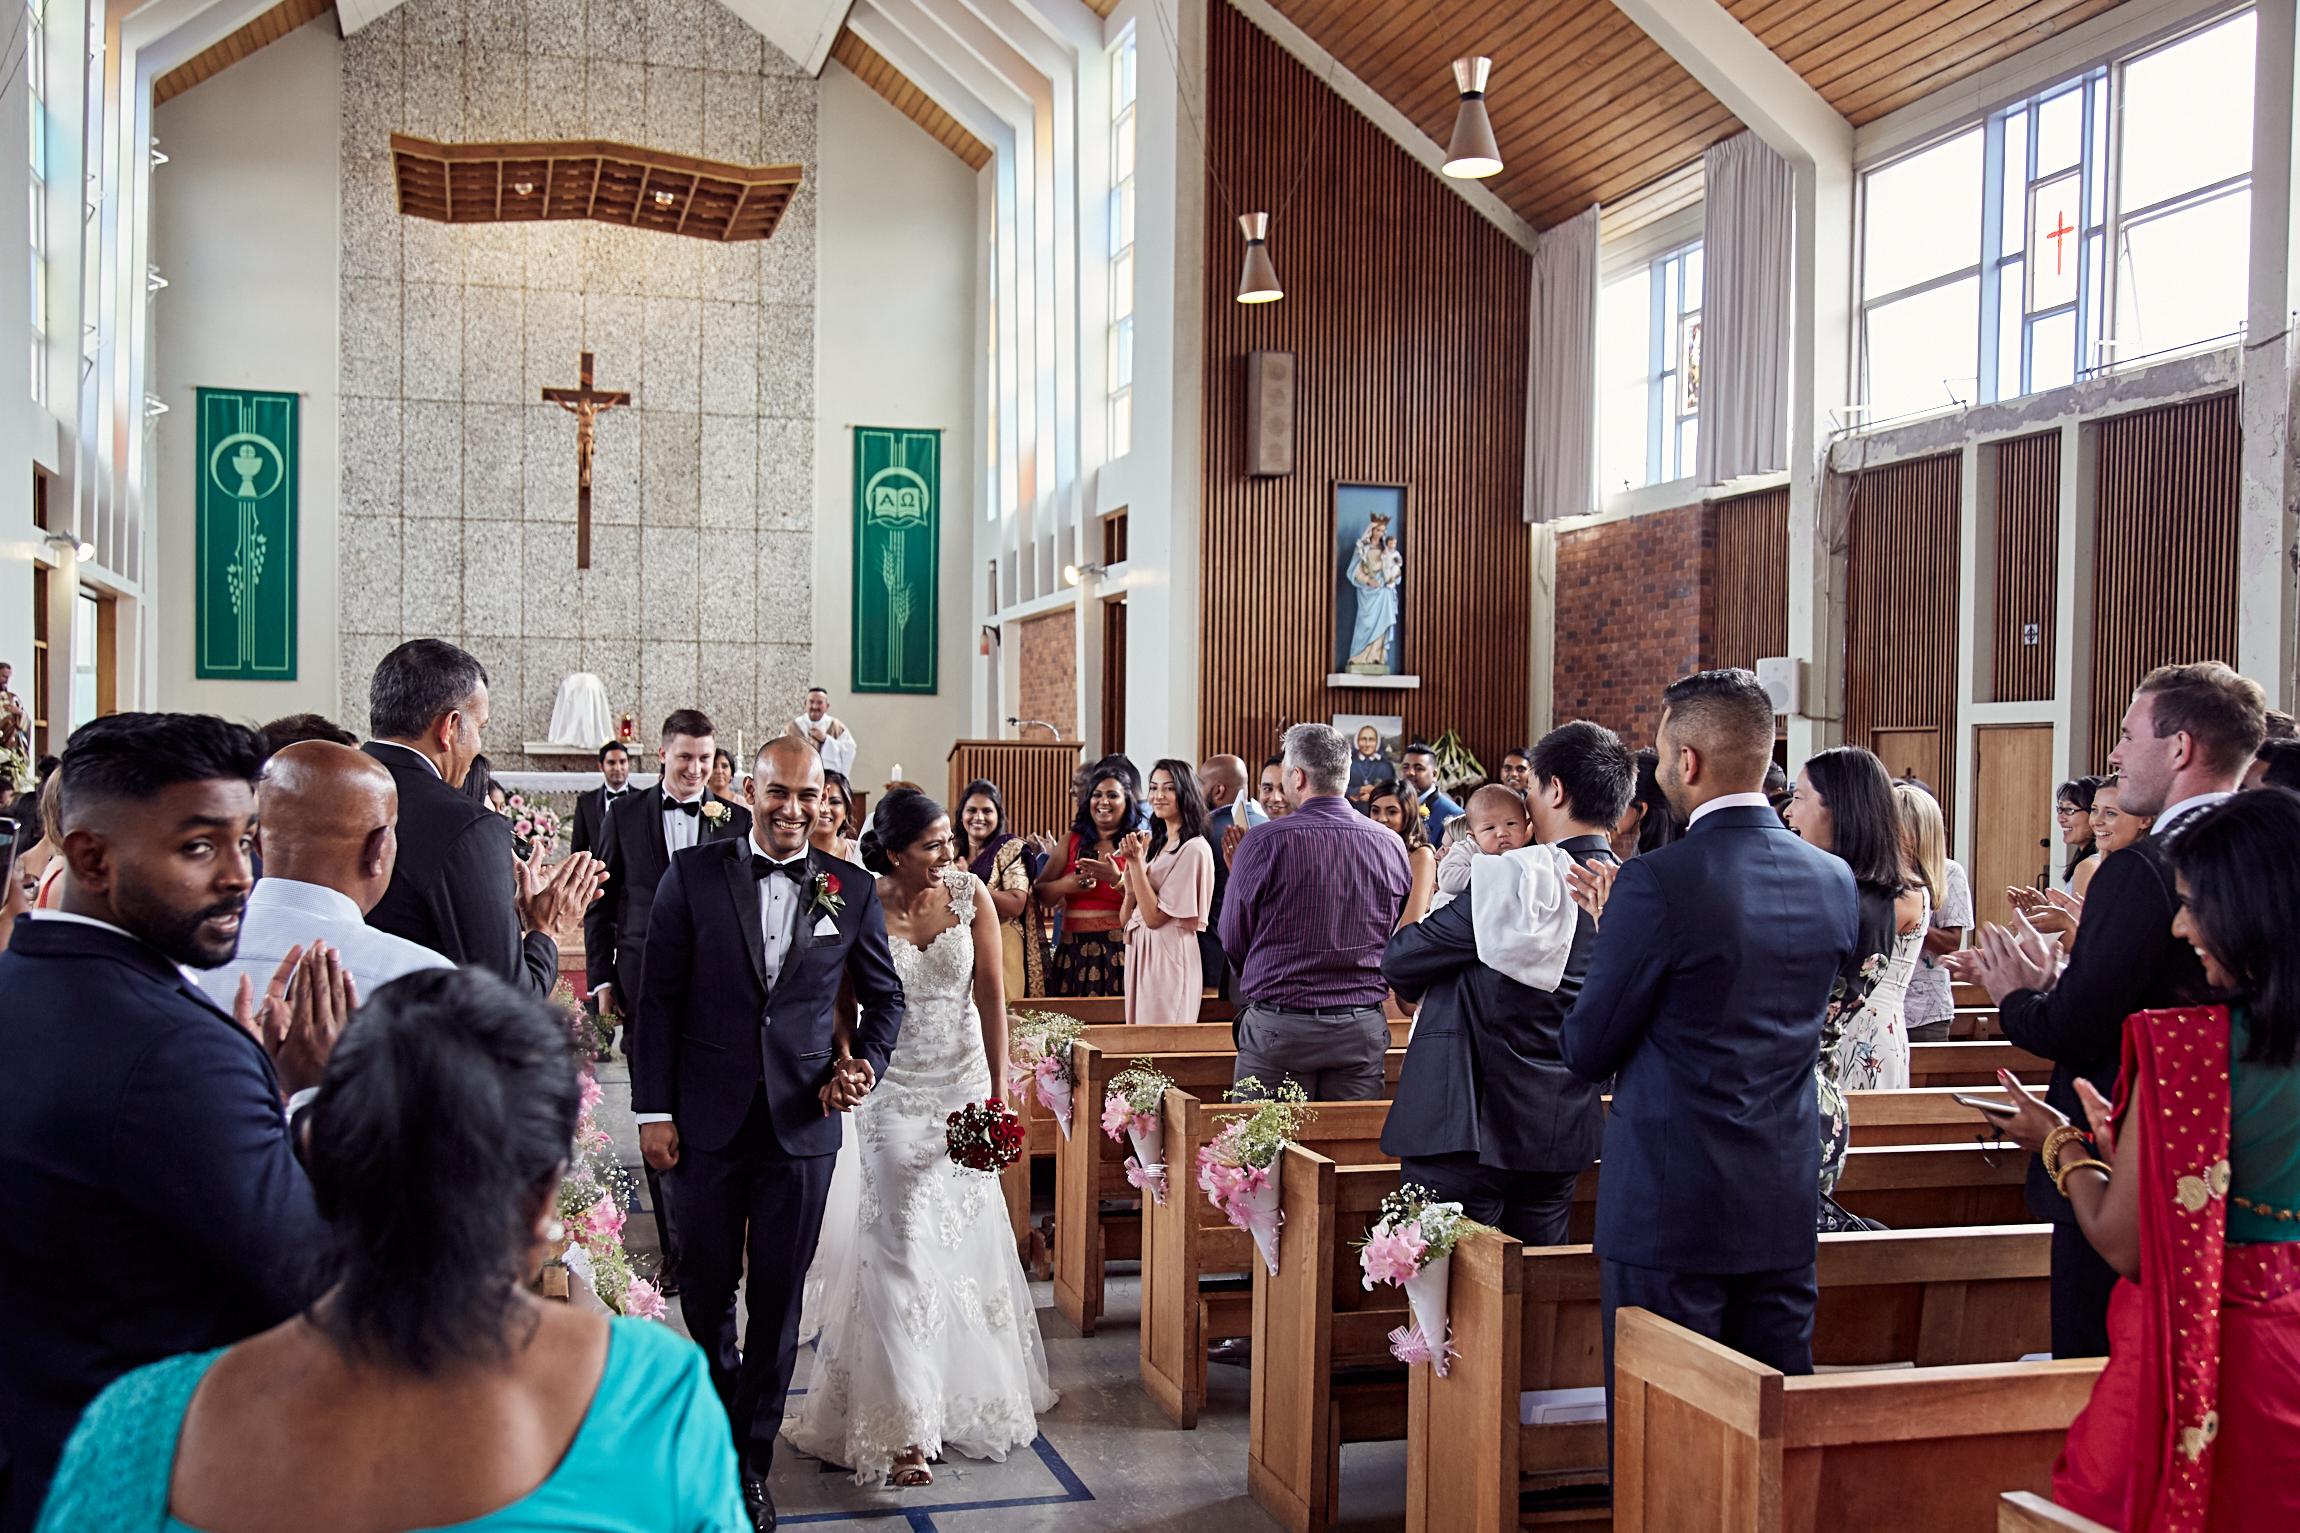 Authentic weddings Auckland